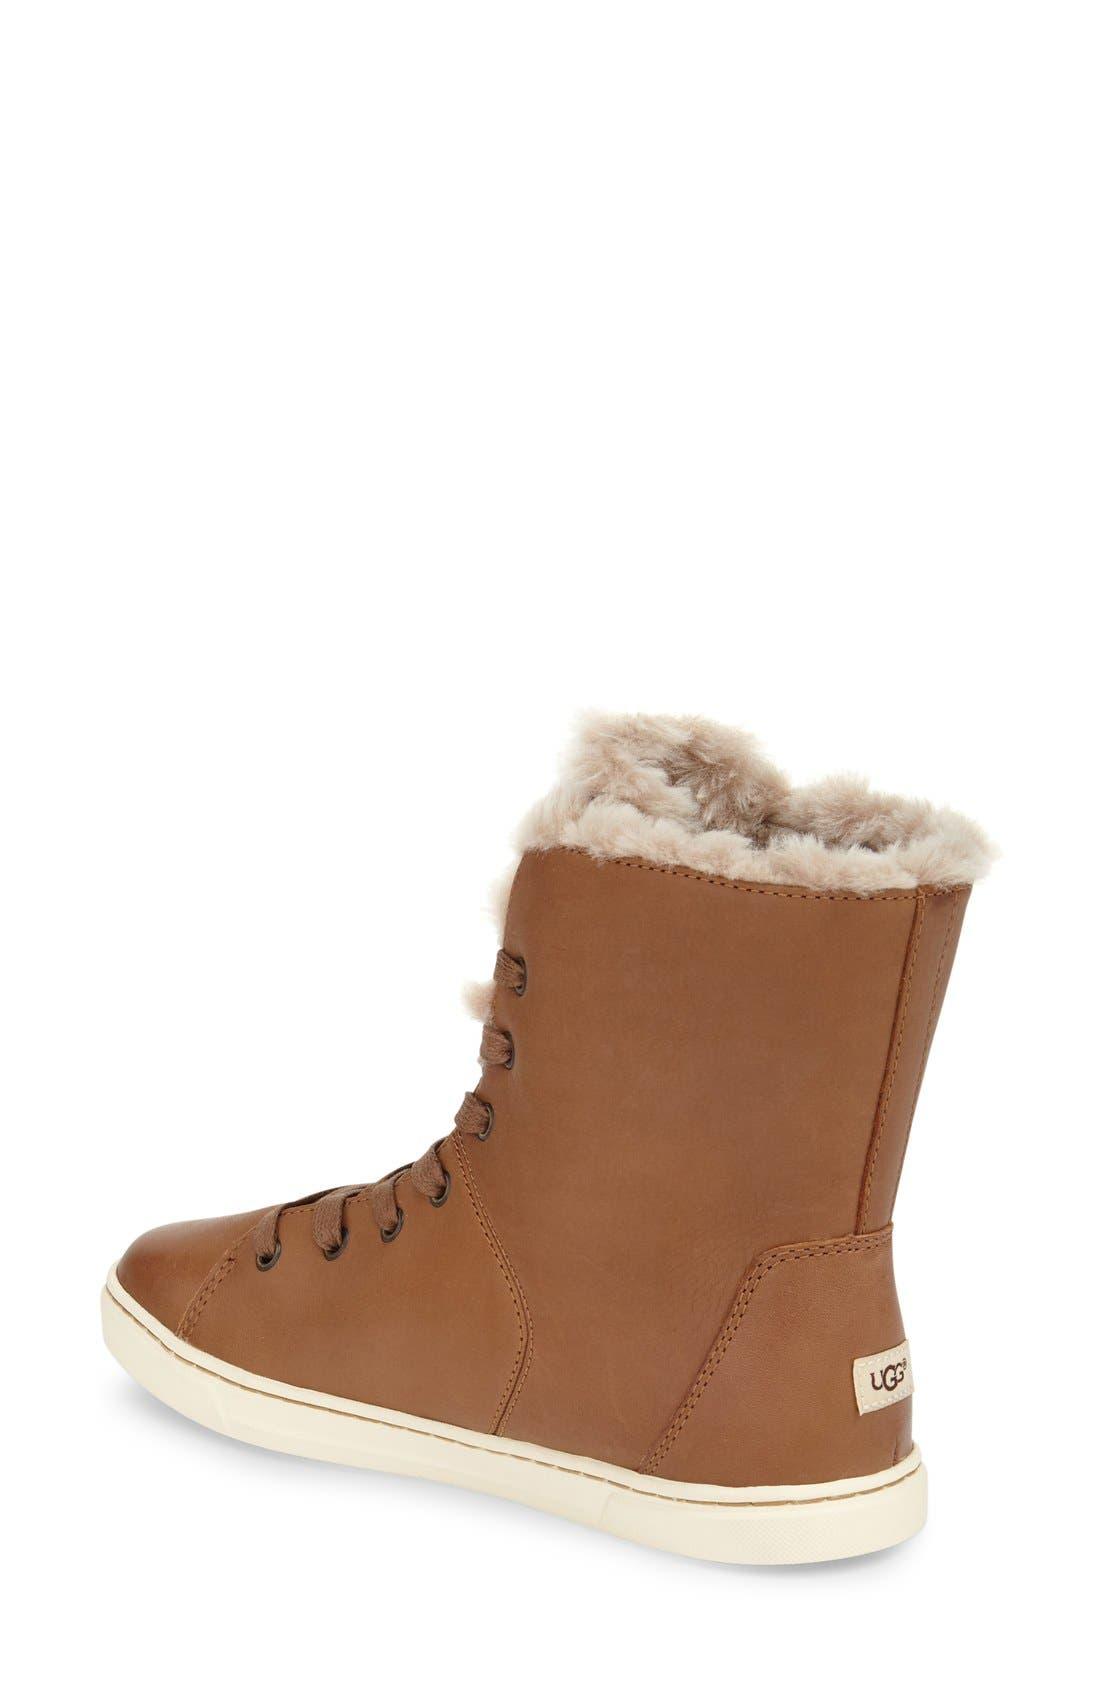 Alternate Image 2  - UGG® 'Croft Luxe' Genuine Shearling High Top Sneaker (Women)